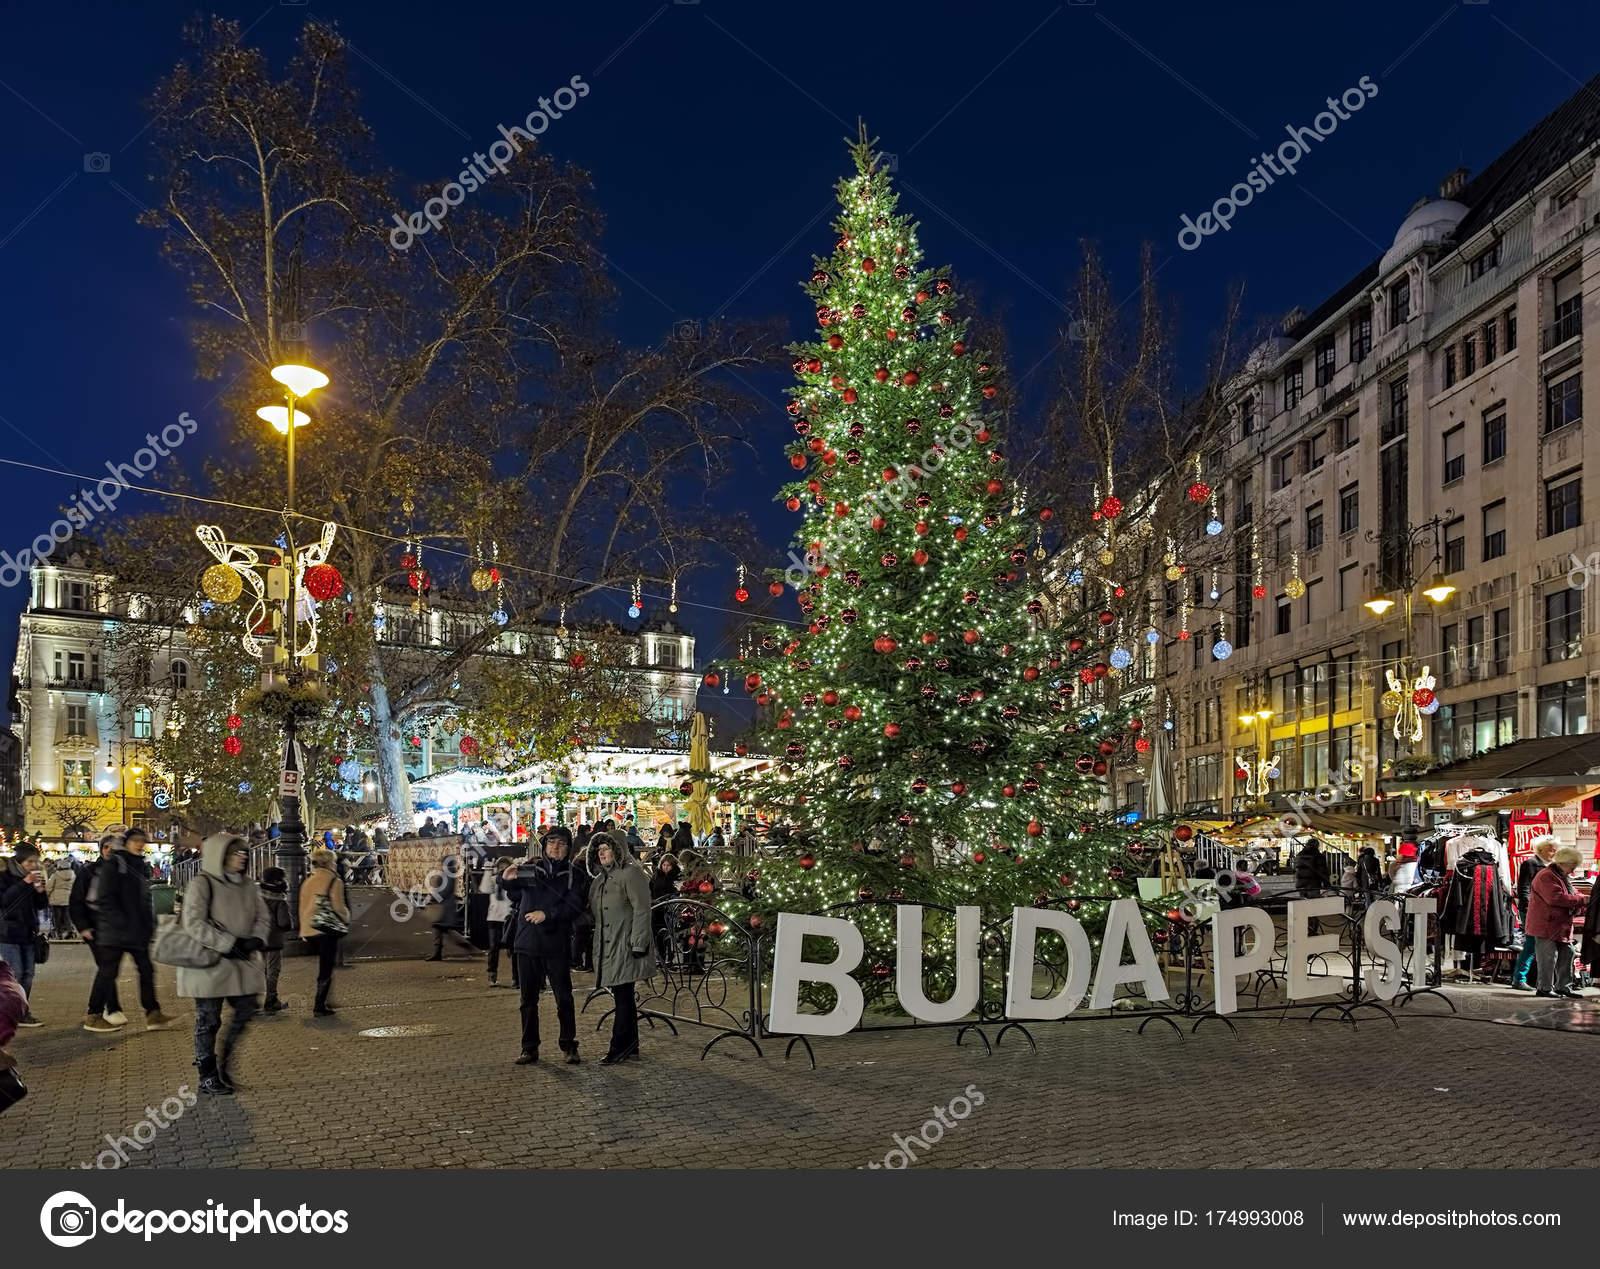 Vorosmarty Square Budapest Christmas Market.Christmas Market On Vorosmarty Square In Budapest Hungary